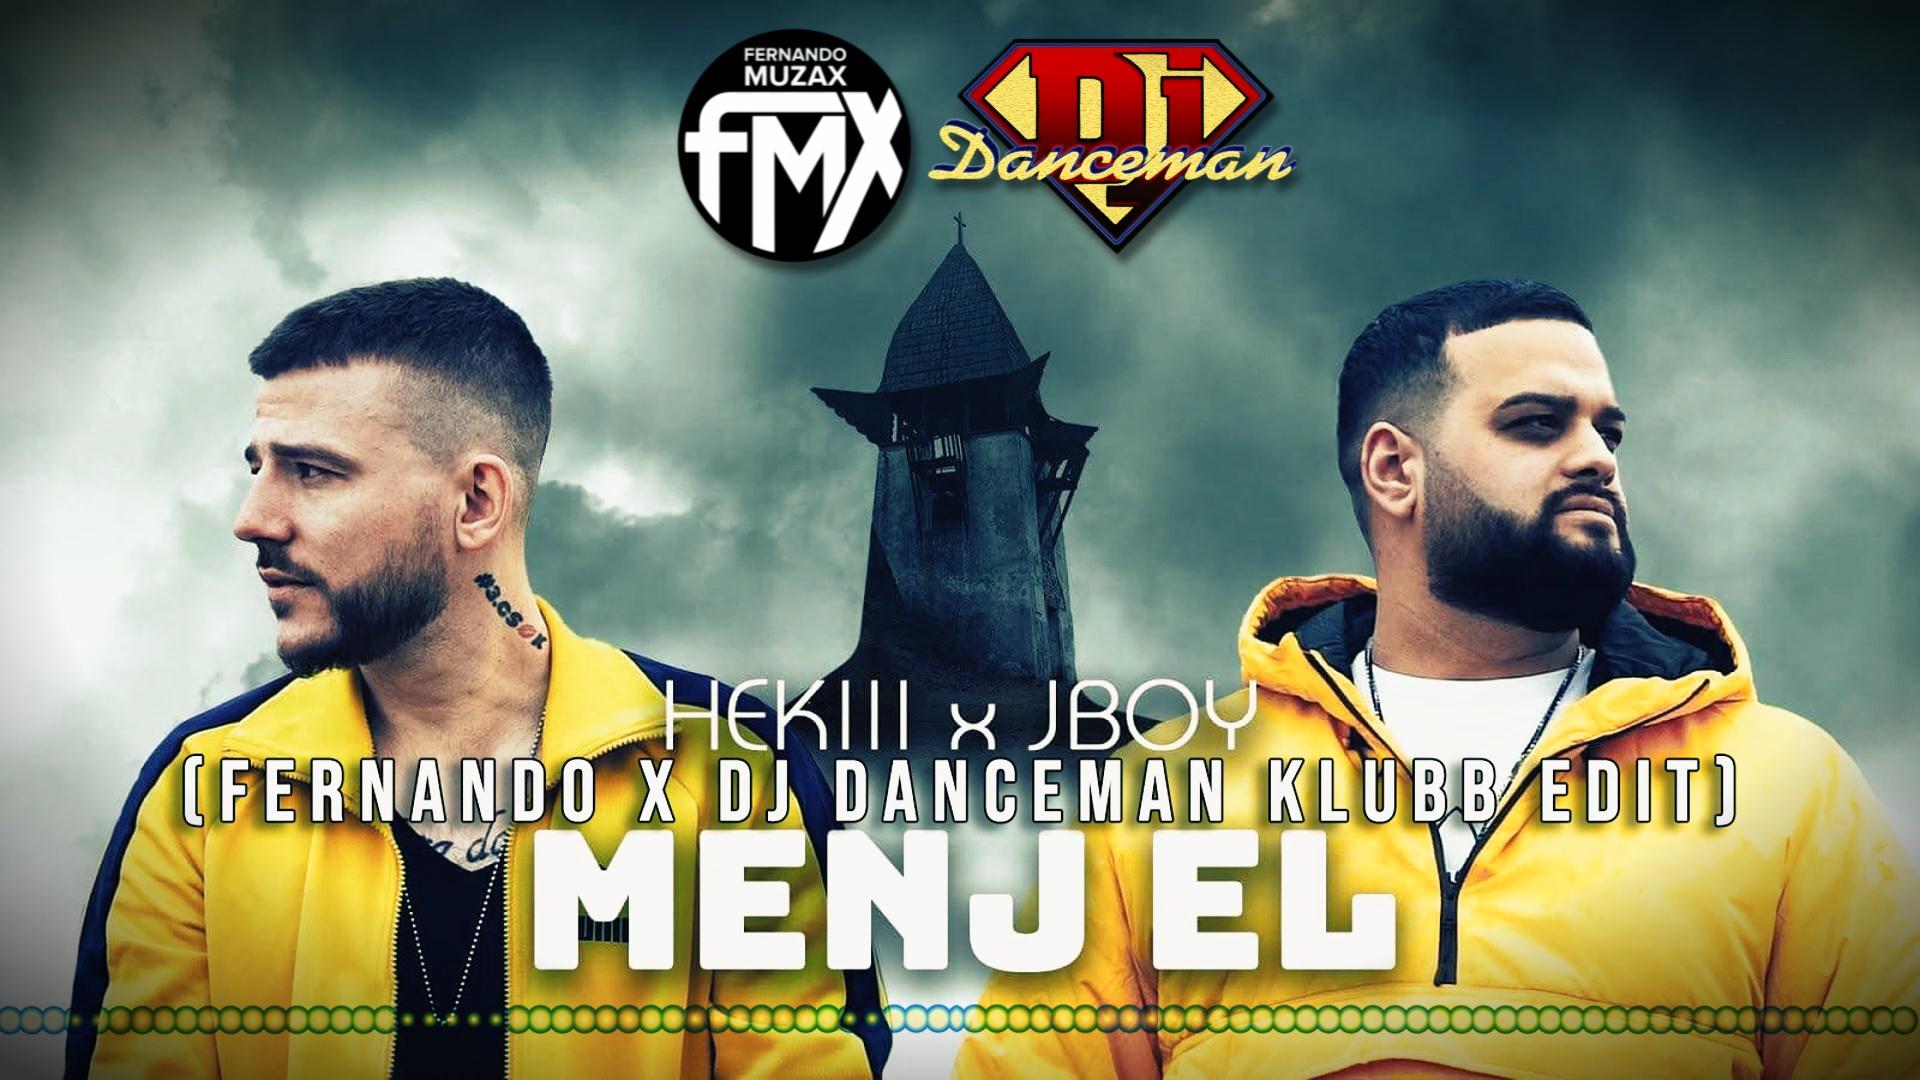 Hekii x JBoy - Menj El (Fernando x Dj Danceman Remix edit)